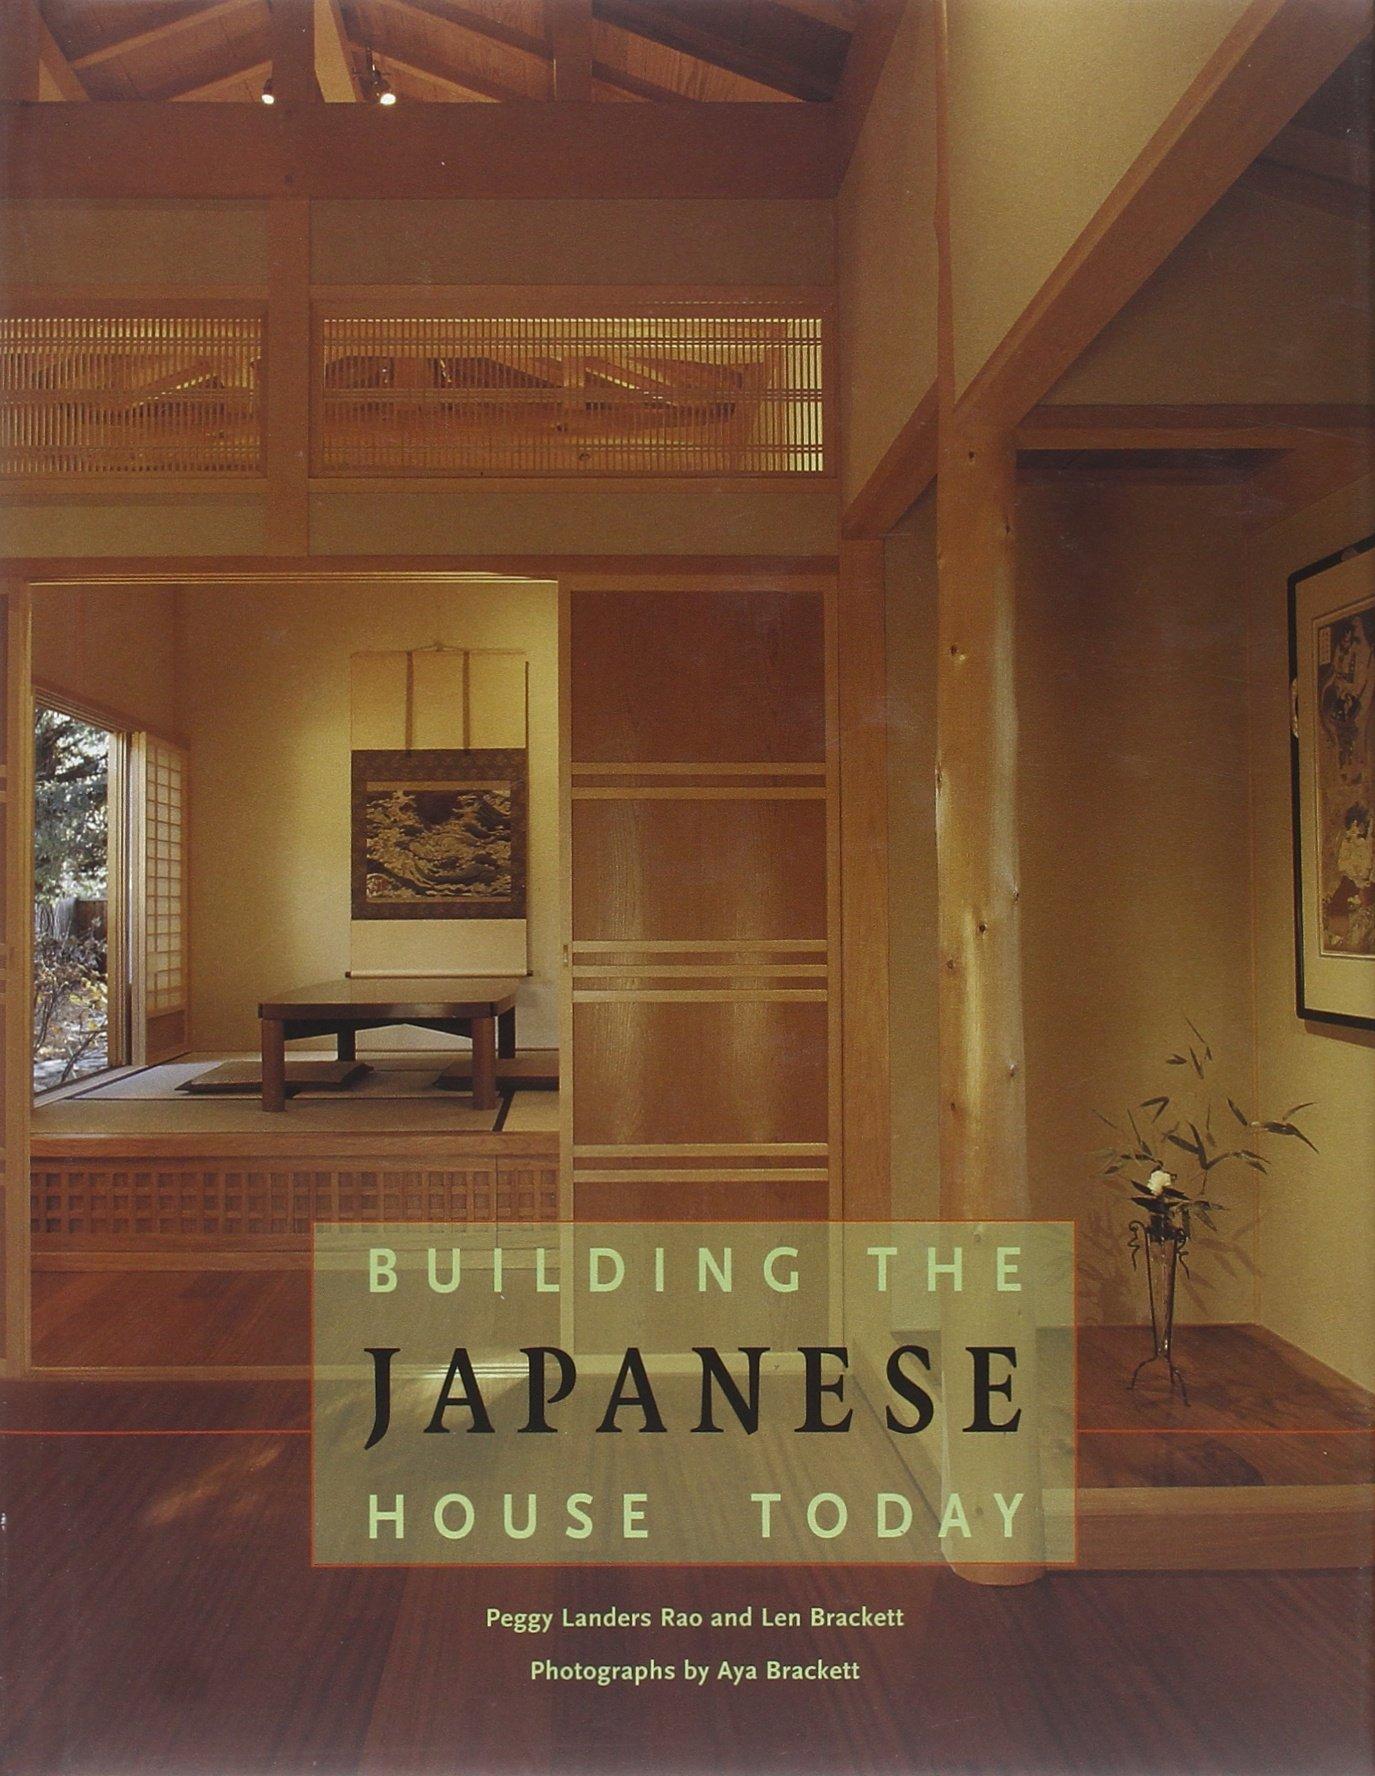 building the japanese house today len brackett and peggy landers building the japanese house today len brackett and peggy landers rao aya brackett 8601400713013 amazon com books